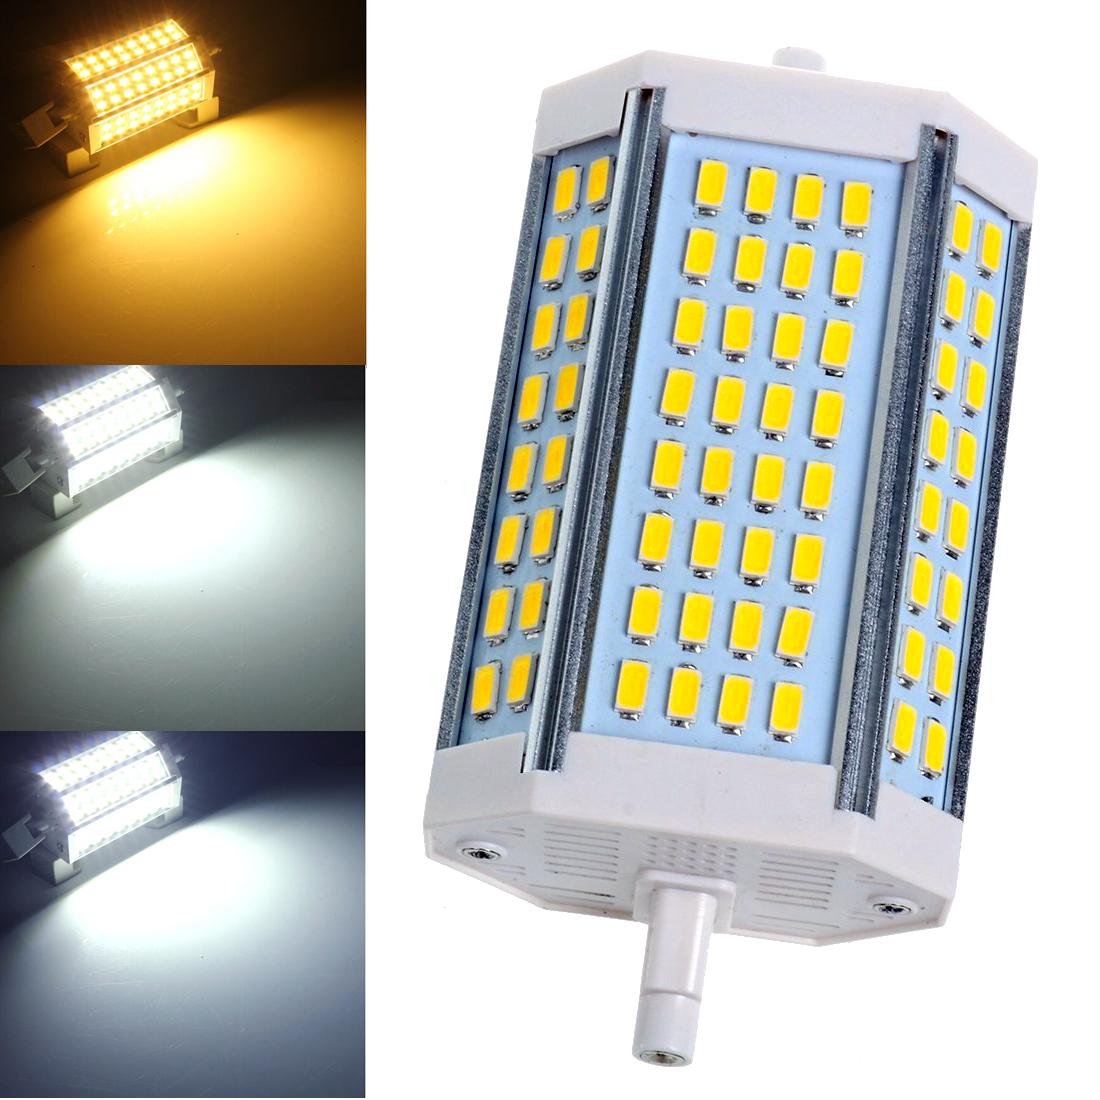 r7s 10w 15w 18w 30w 5730 smd led flood light replacement halogen lamp tube bulb ebay. Black Bedroom Furniture Sets. Home Design Ideas